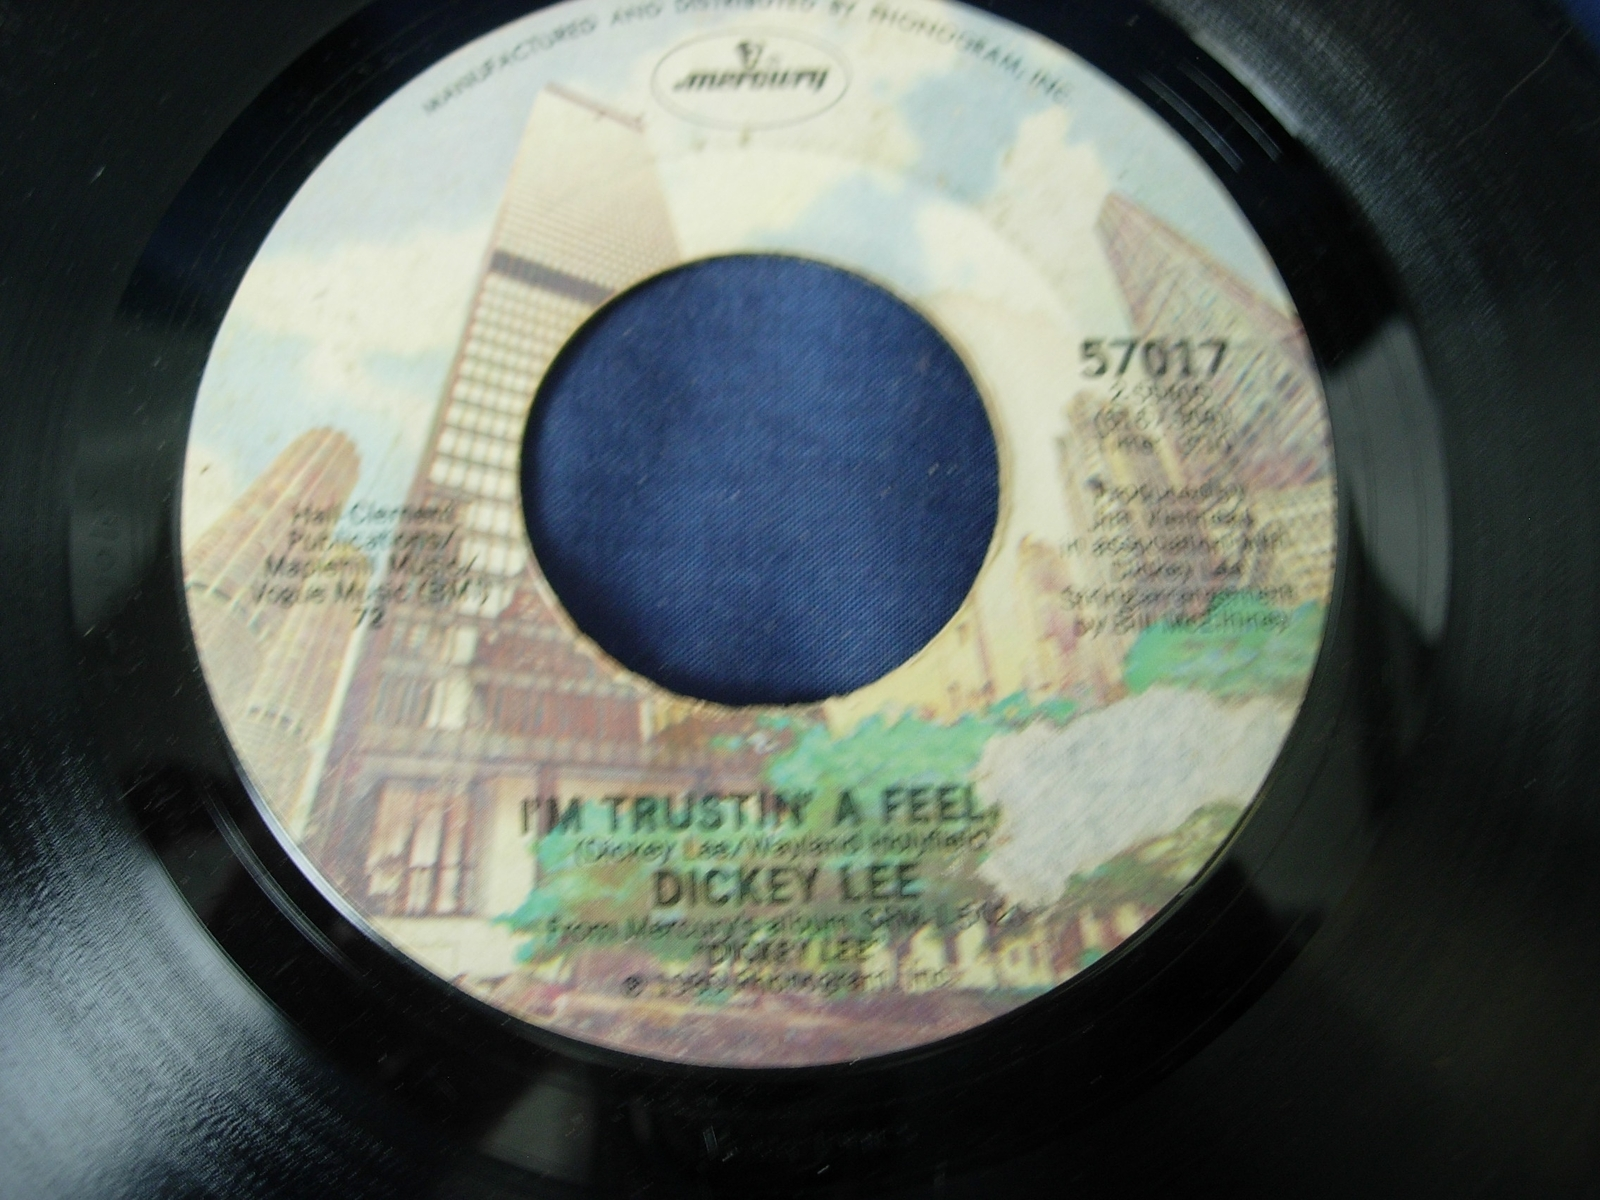 Dickey Lee - Don't Look Back / I'm Trustin - Mercury Records 57017